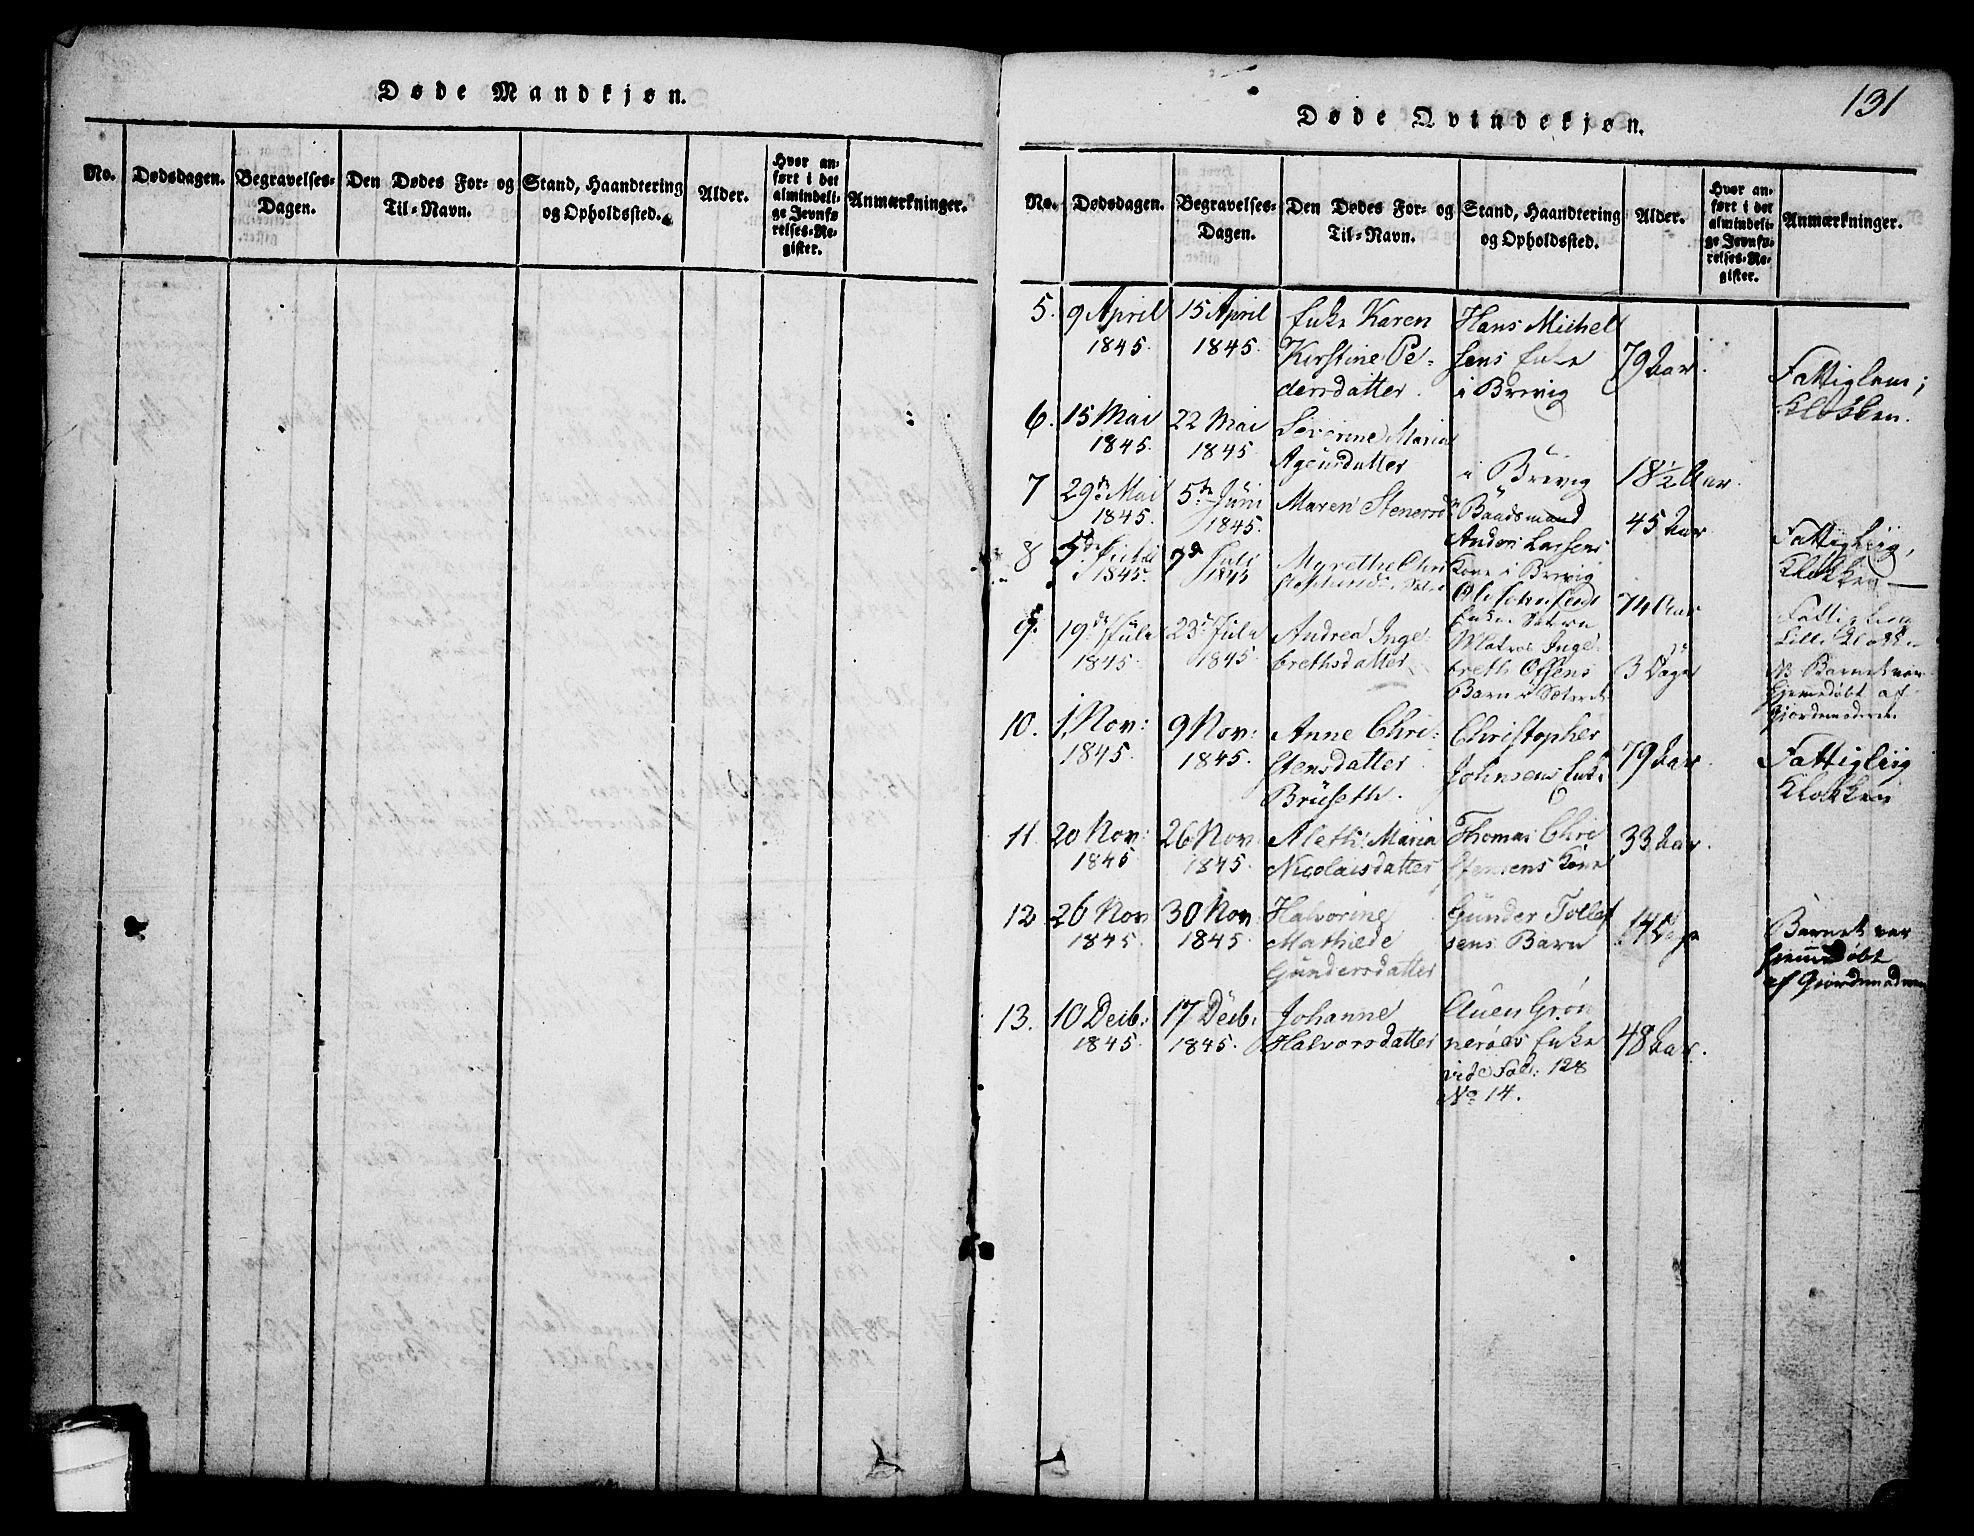 SAKO, Brevik kirkebøker, G/Ga/L0001: Klokkerbok nr. 1, 1814-1845, s. 131